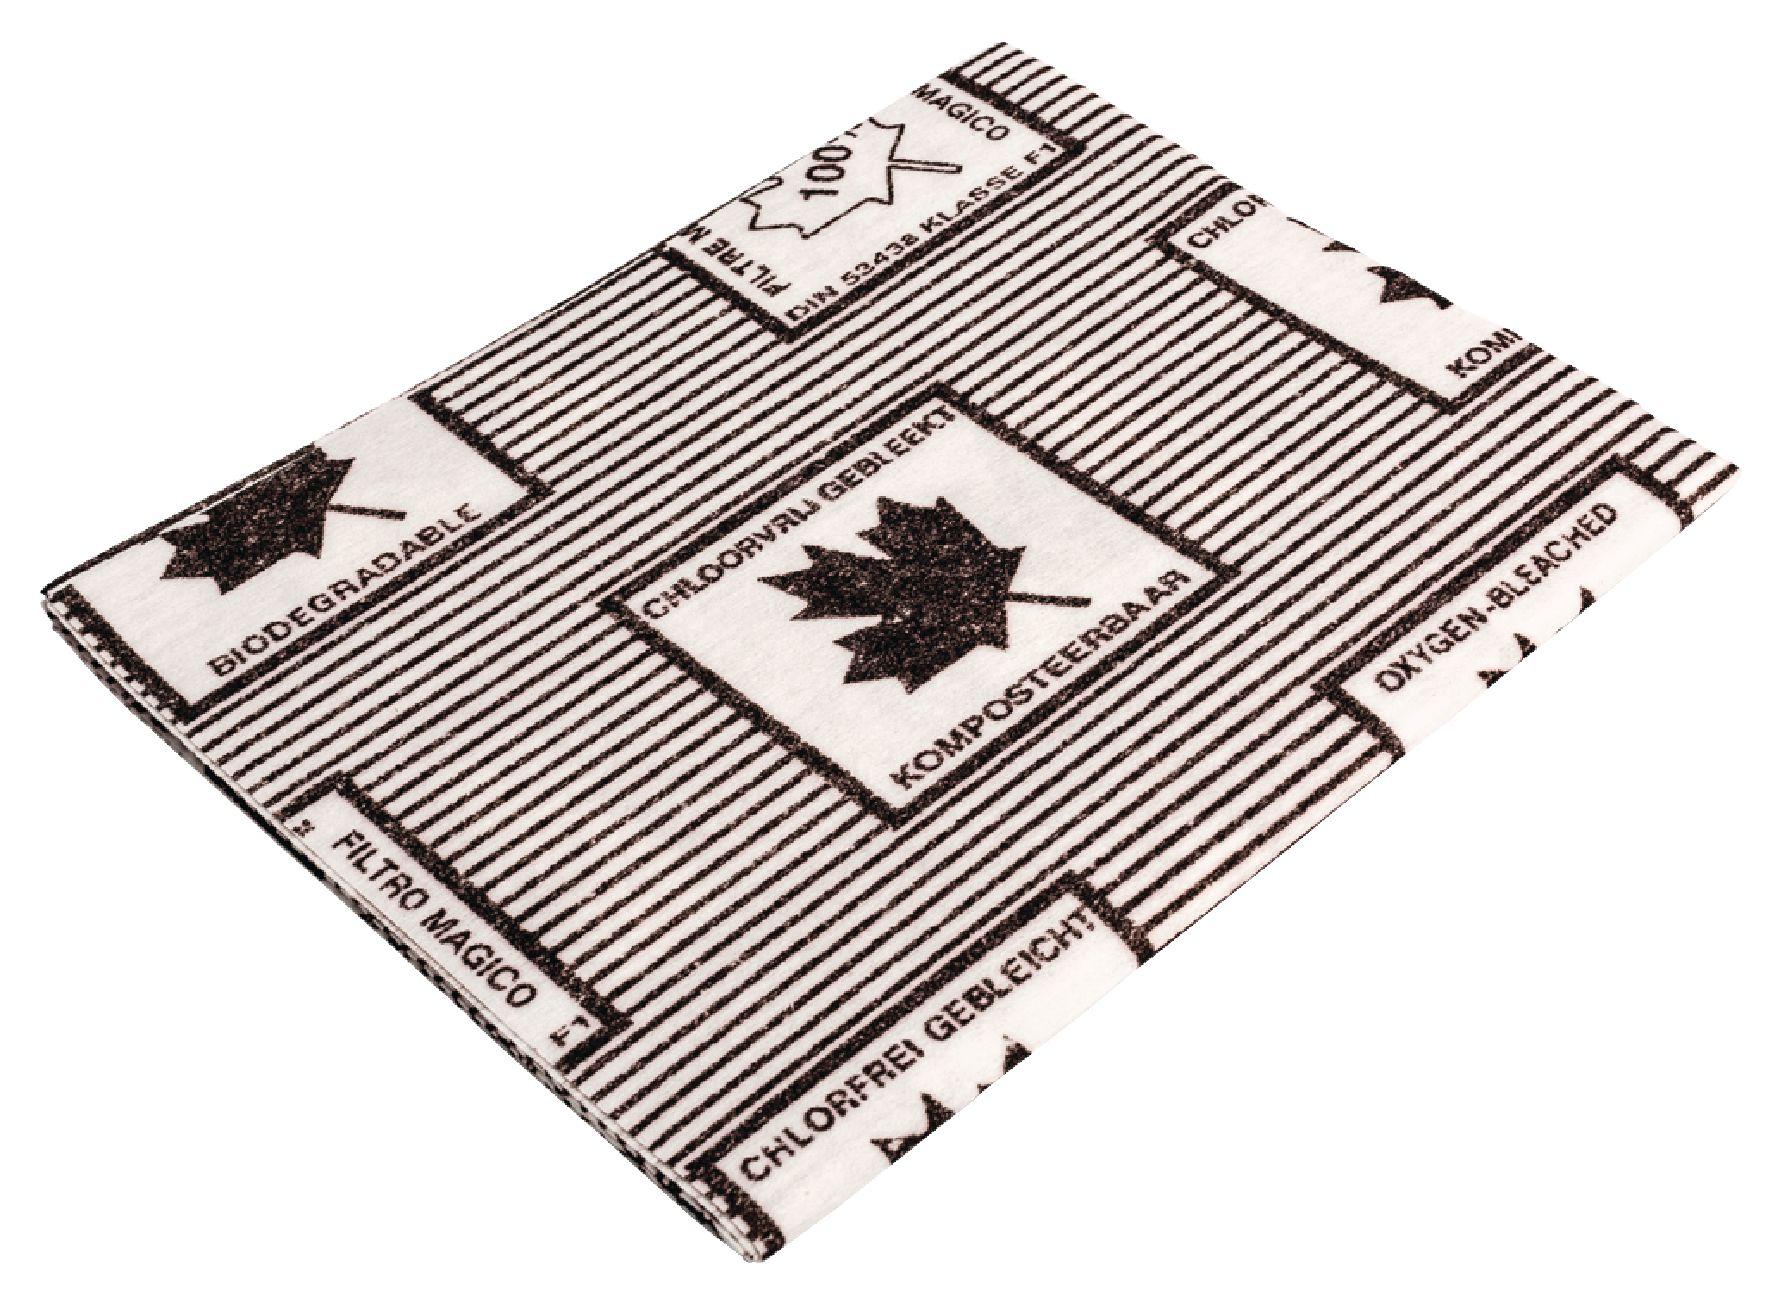 Tukový filtr do digestoře, 114 x 47 cm HQ W4-49900/4